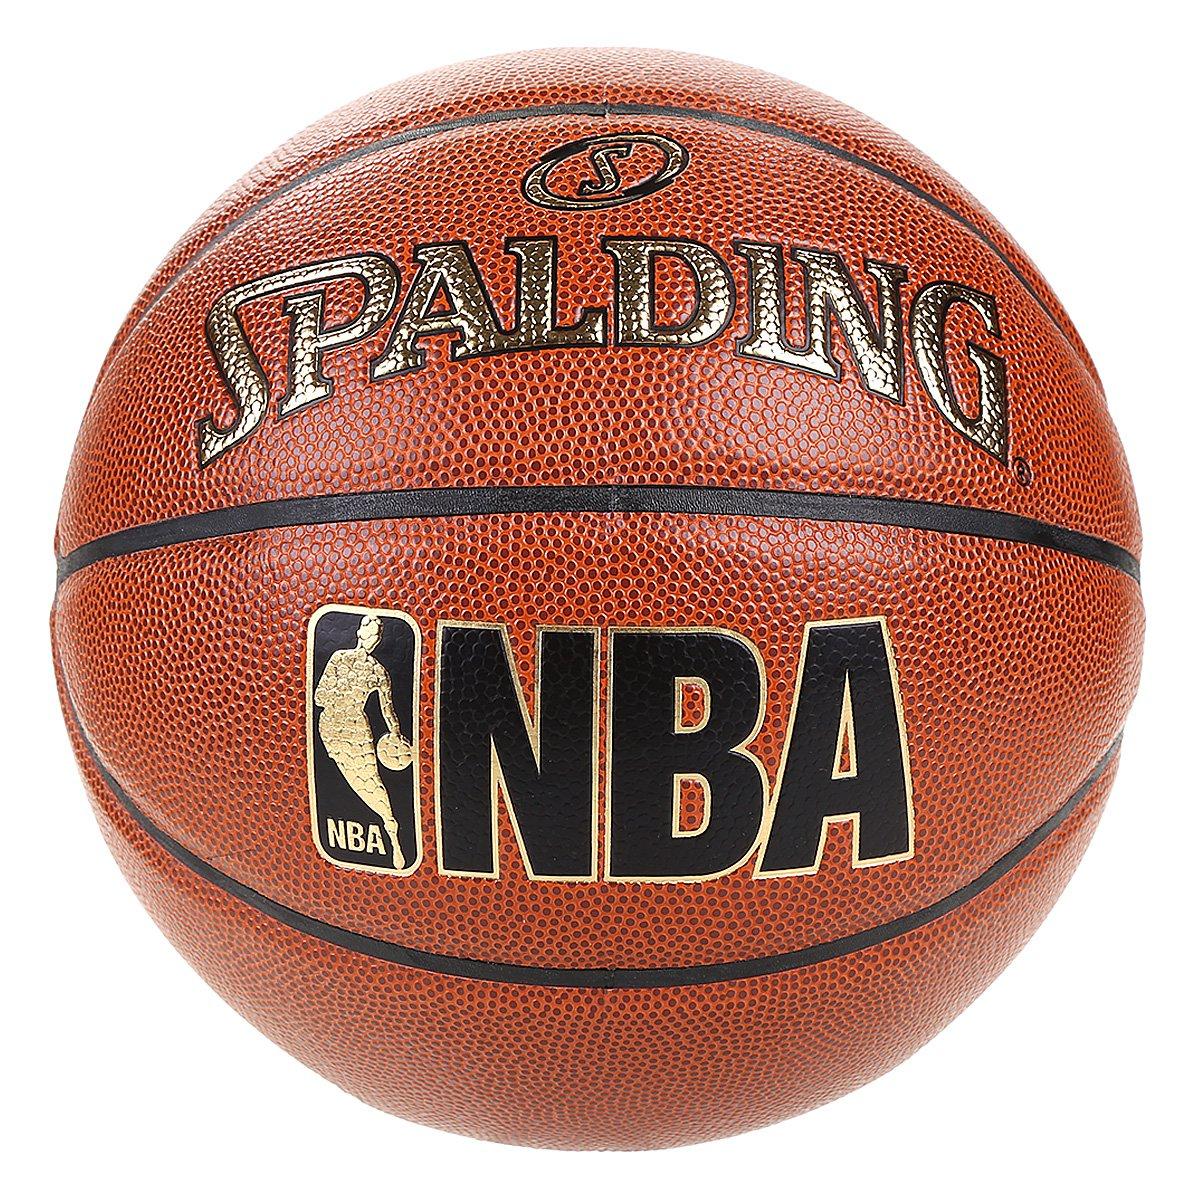 Bola Basquete Spalding NBA Jr 2015 Tamanho 7